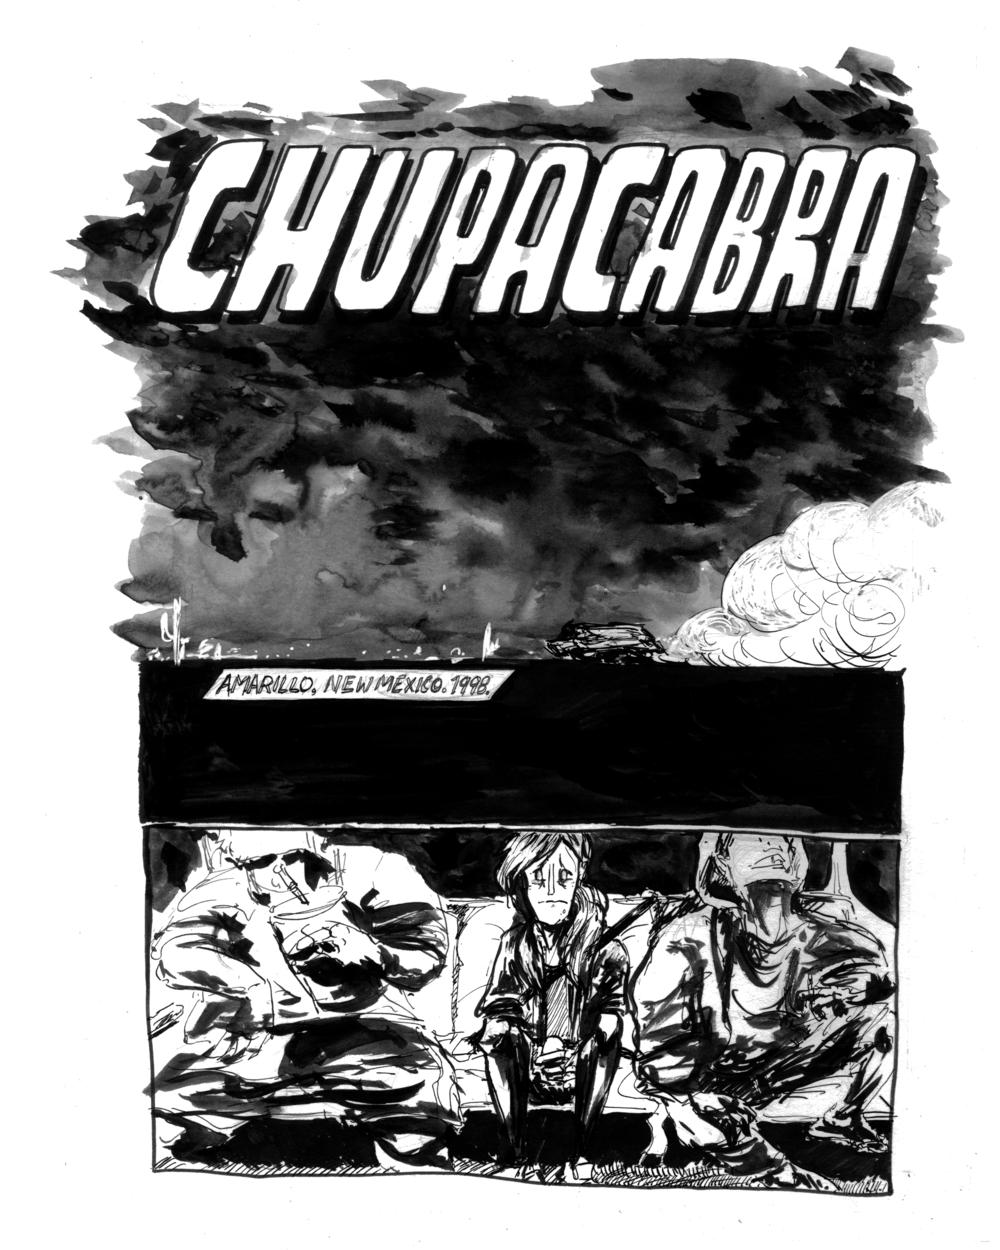 chupacabra1.png